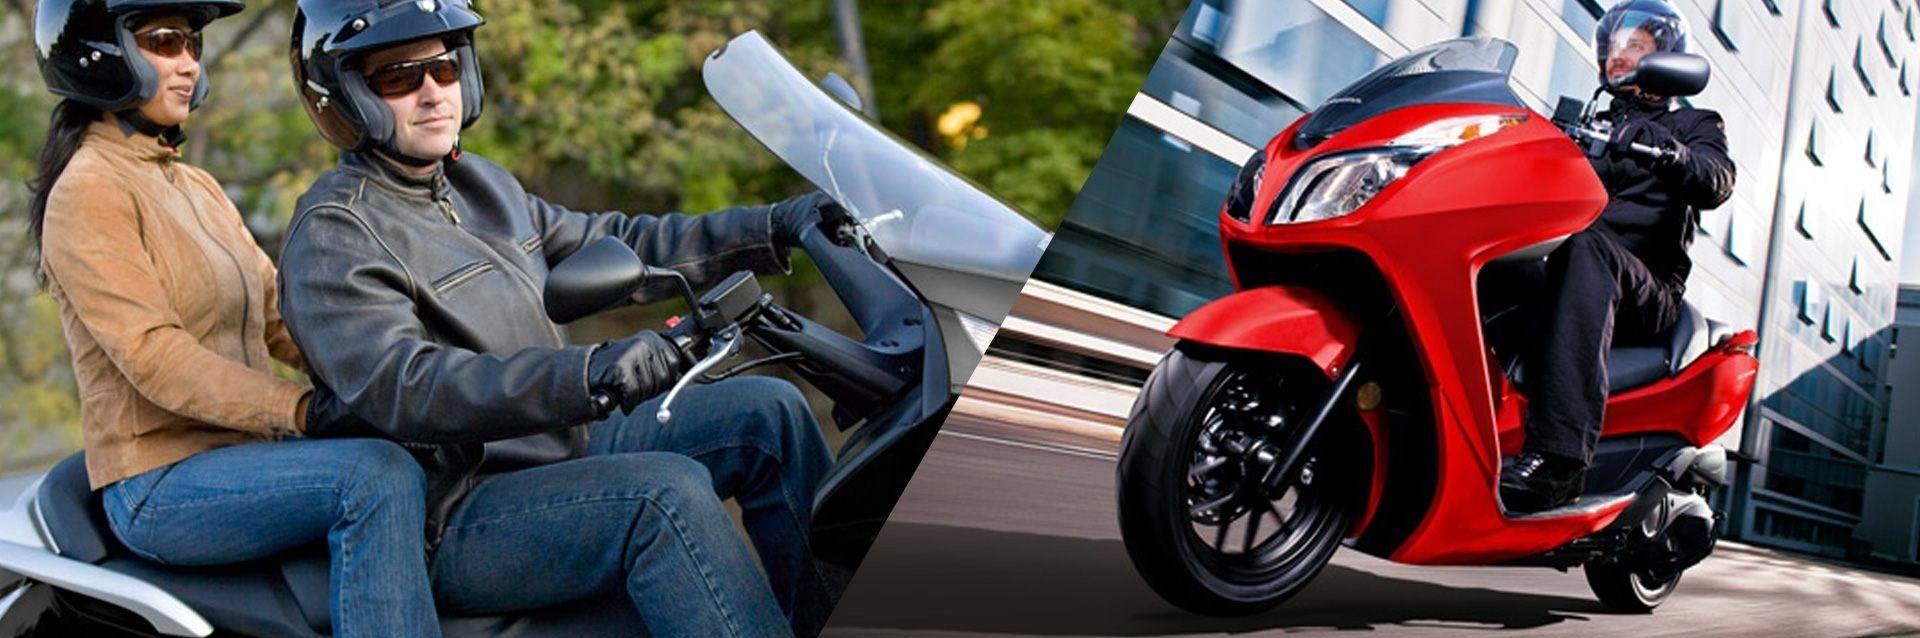 Motorcycle Dealer - New York Honda/Yamaha  Scooter, Parts